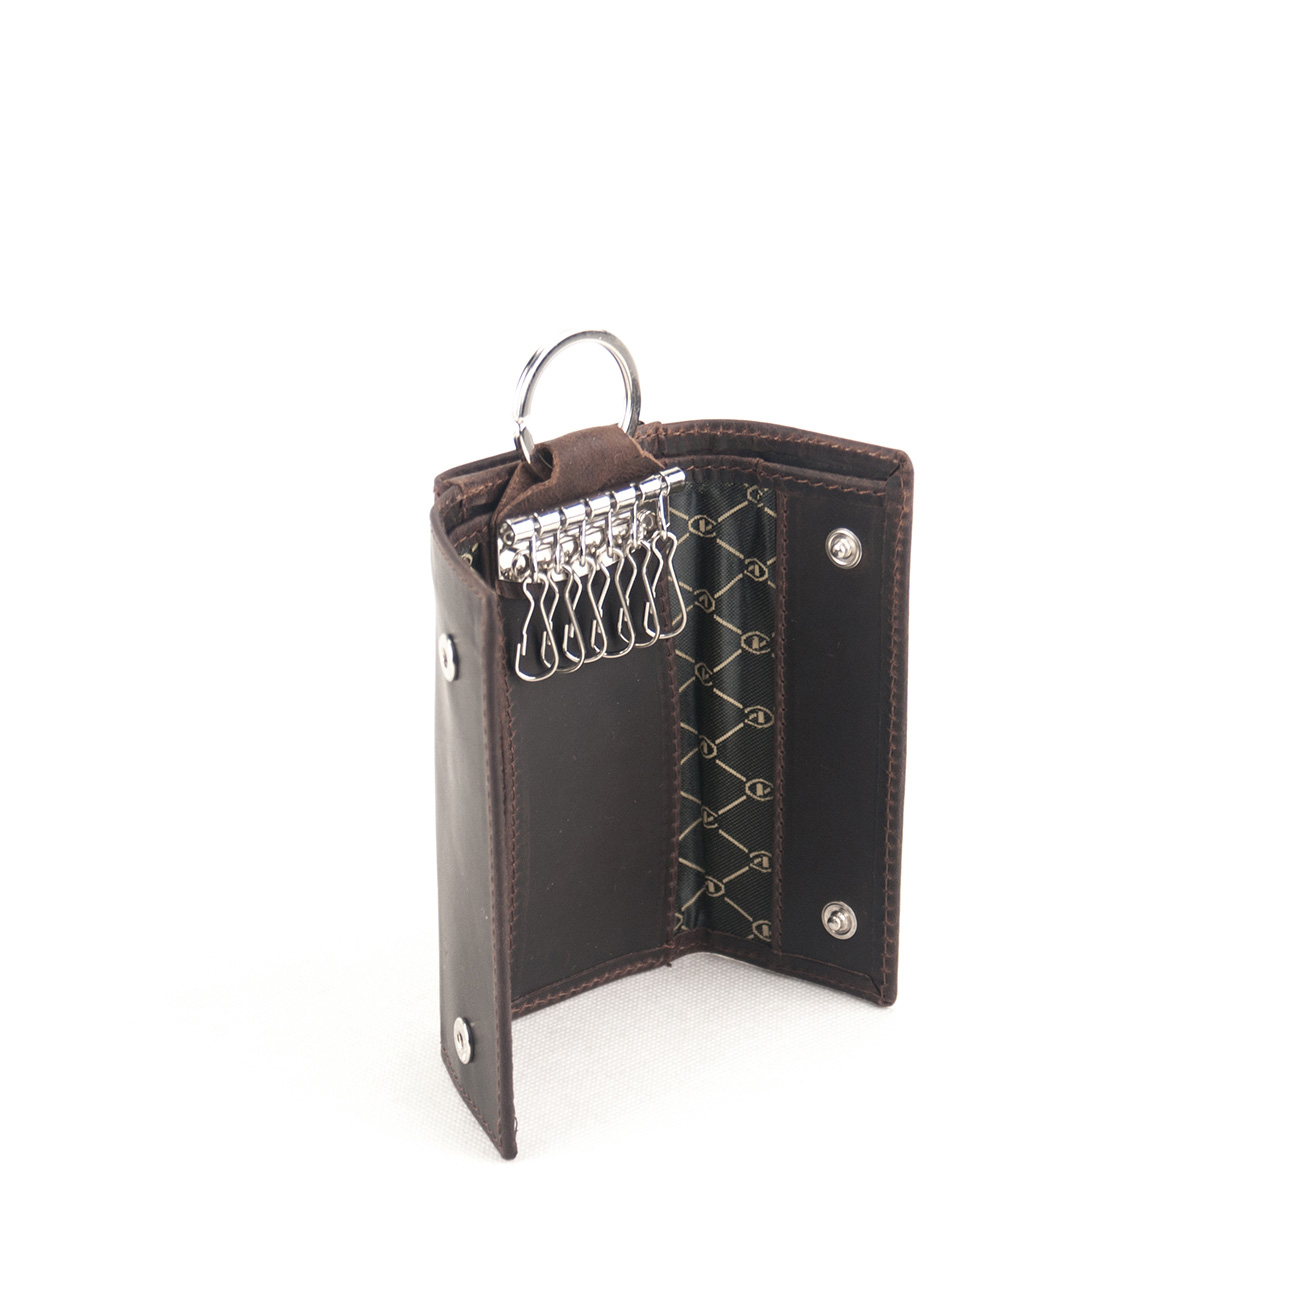 6b4651cfc6 Kouros Δερμάτινη Κλειδοθήκη - Πορτοφόλι Model GO7 Χρώμα Καφέ Σκούρο ...